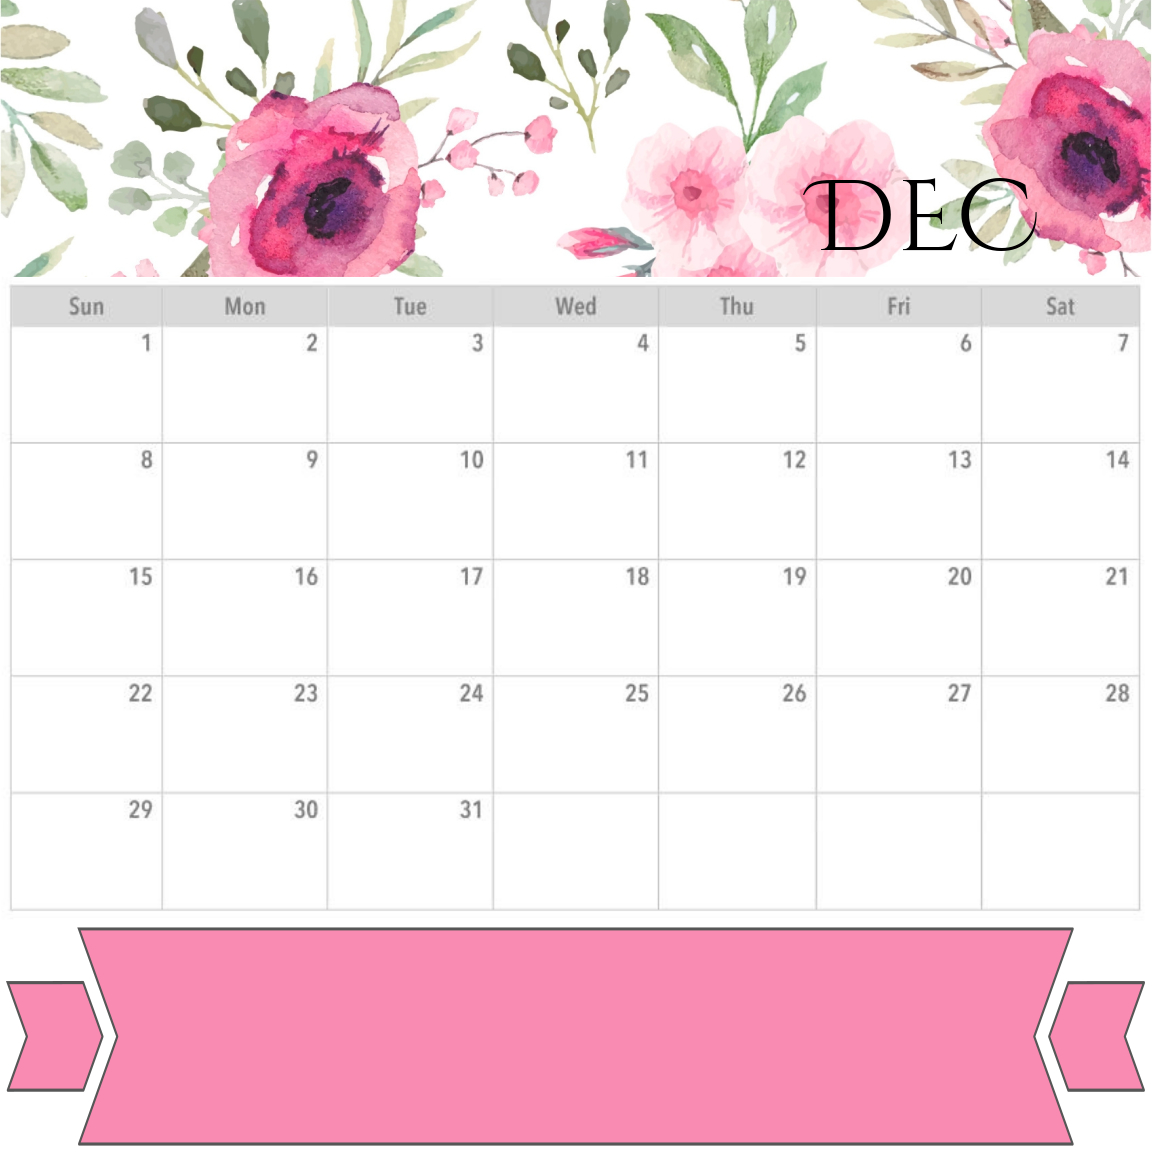 December 2019 Calendar Download